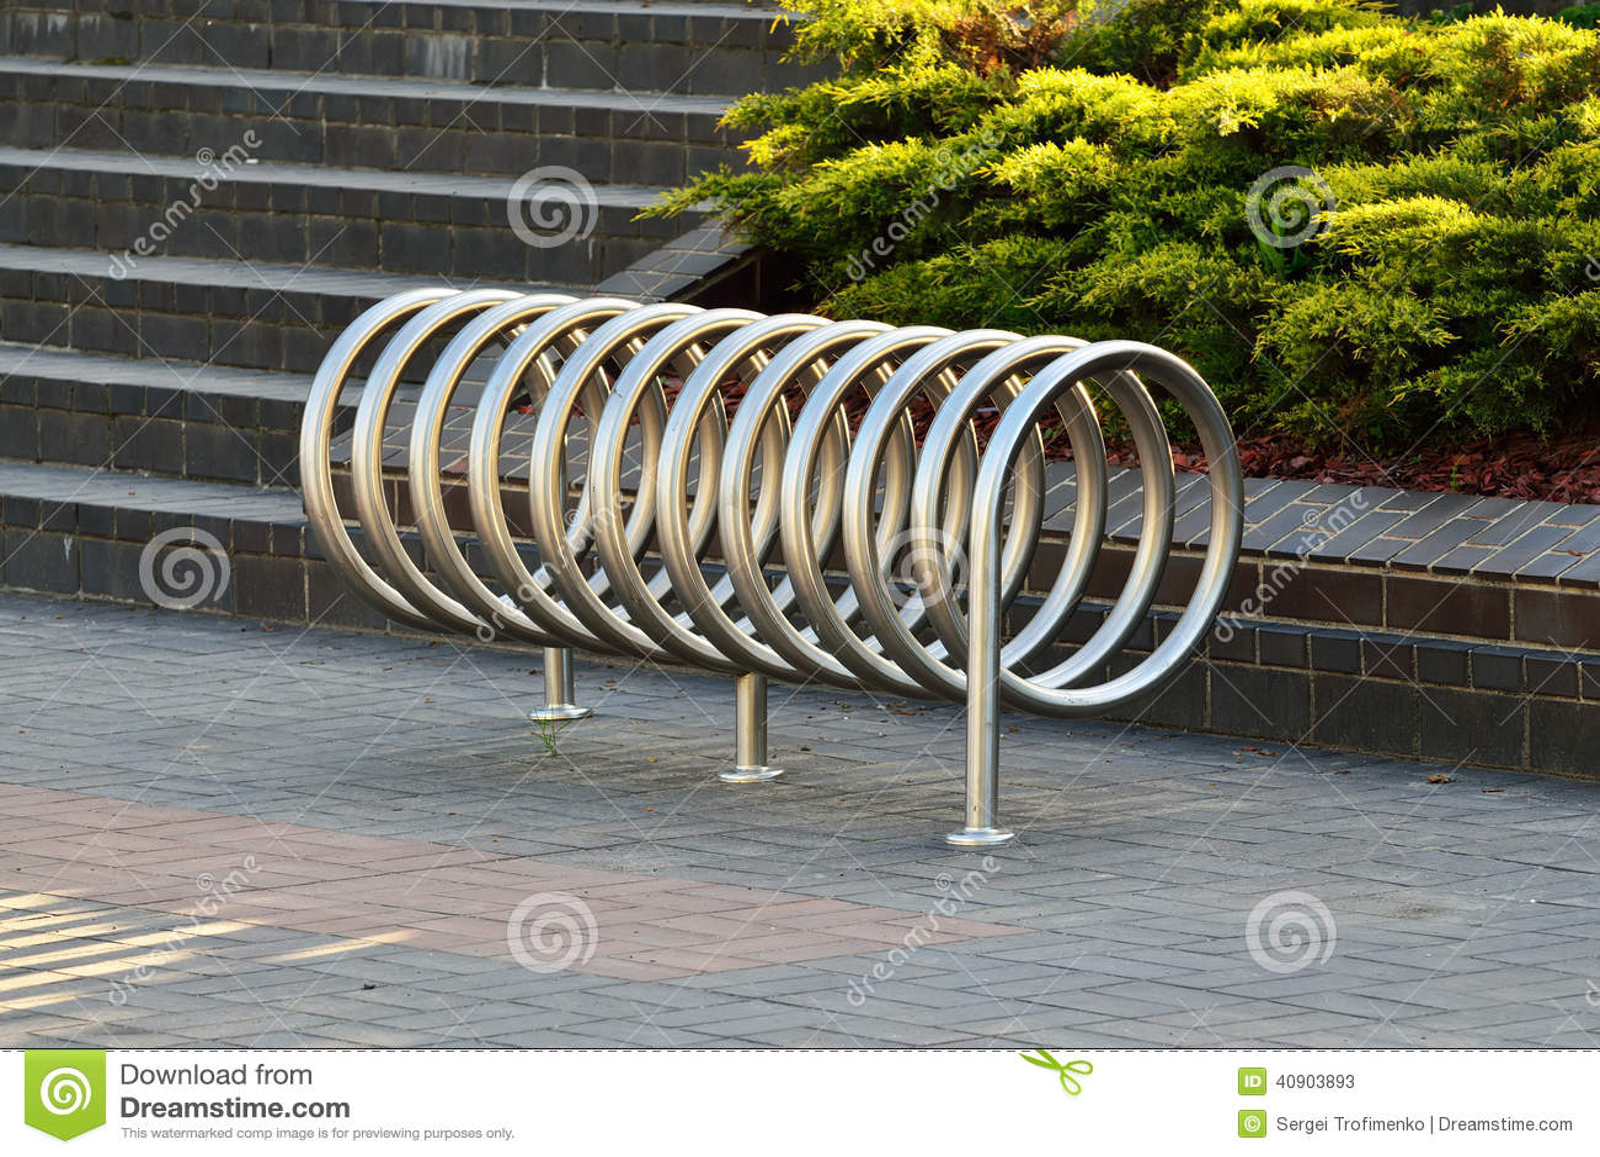 ^ Bike Shed Stock Photo - Image: 40903893